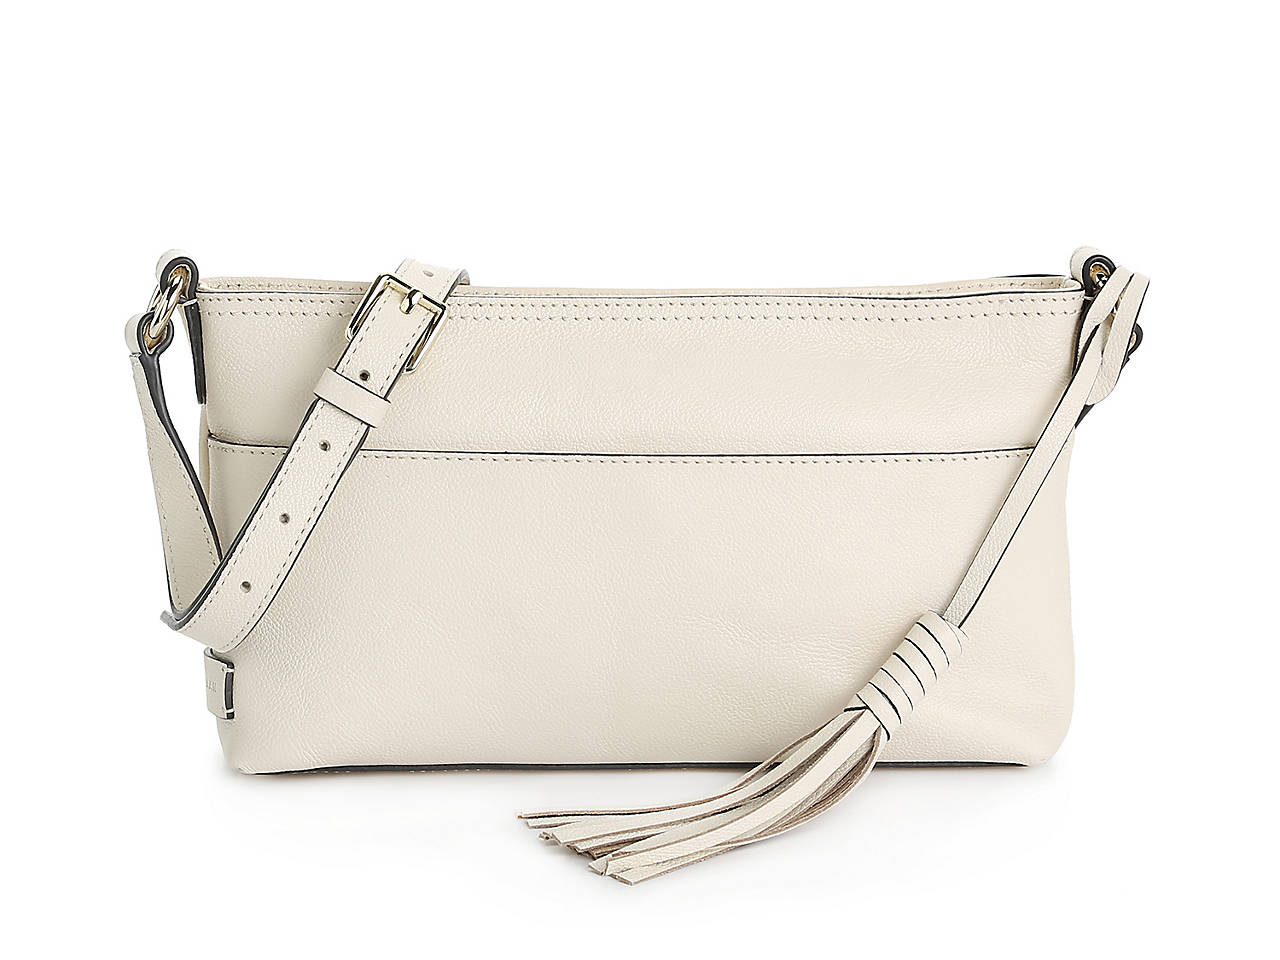 2b3f1e95e96 Cole Haan Tassel Leather Crossbody Bag Women's Handbags ...